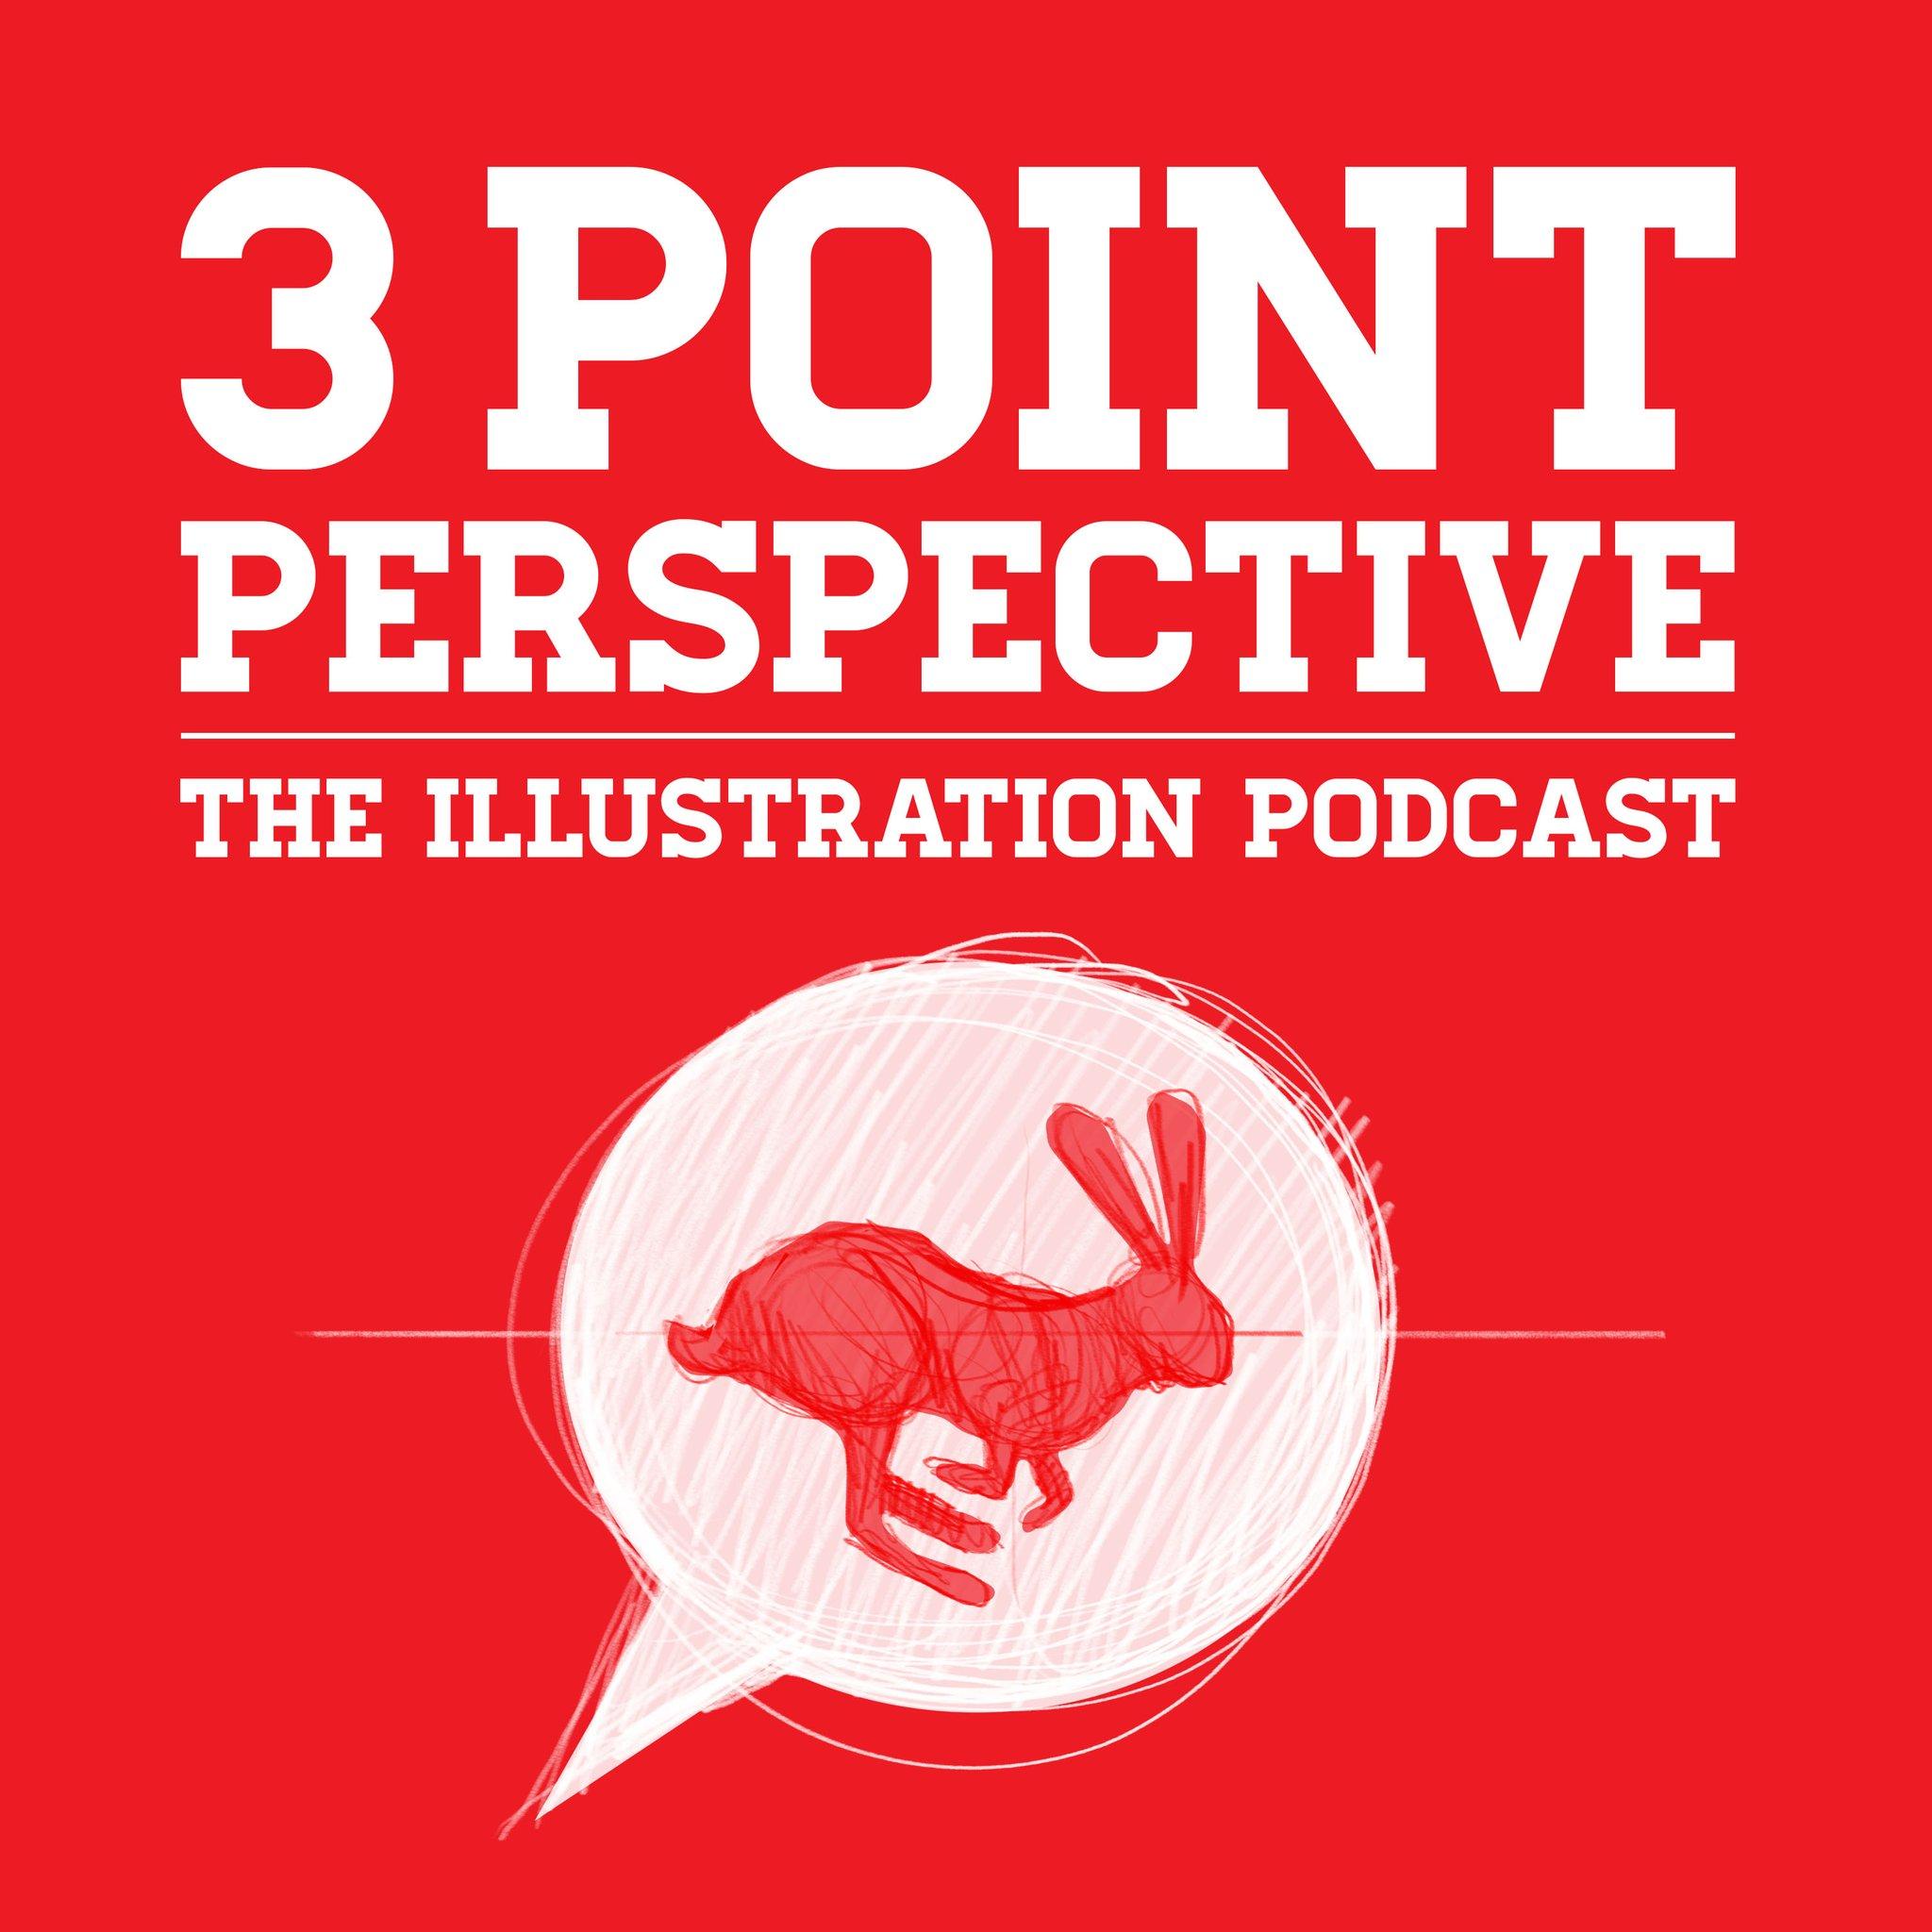 3 Point Perspective logo.jpg